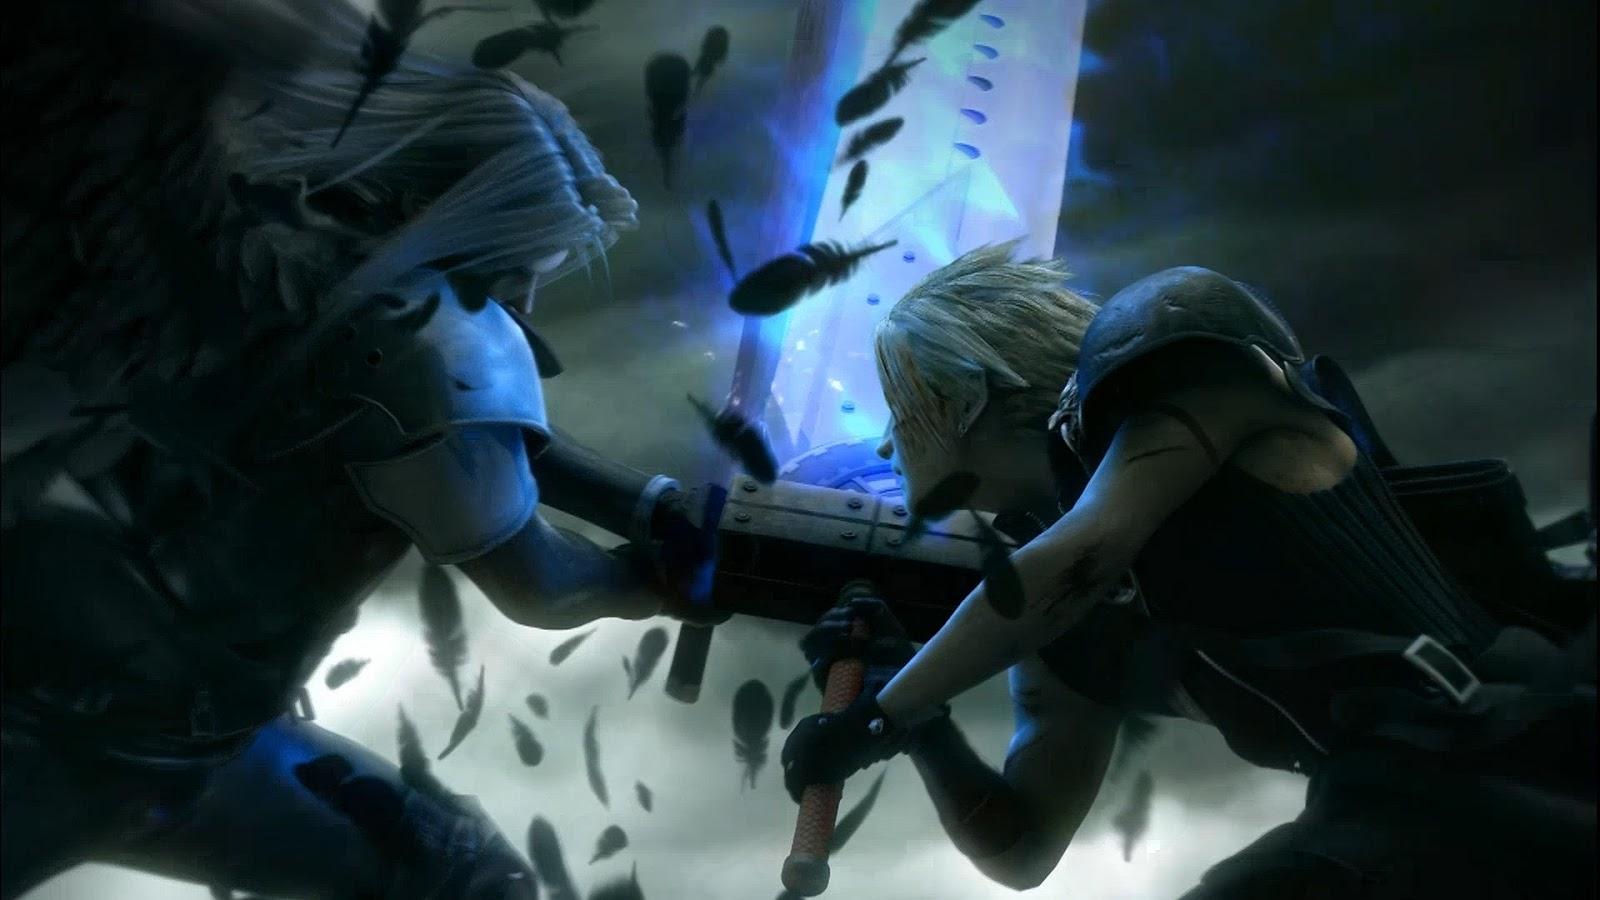 VII Advent Children Sephiroth vs Cloud Strife Mystery Wallpaper 1600x900